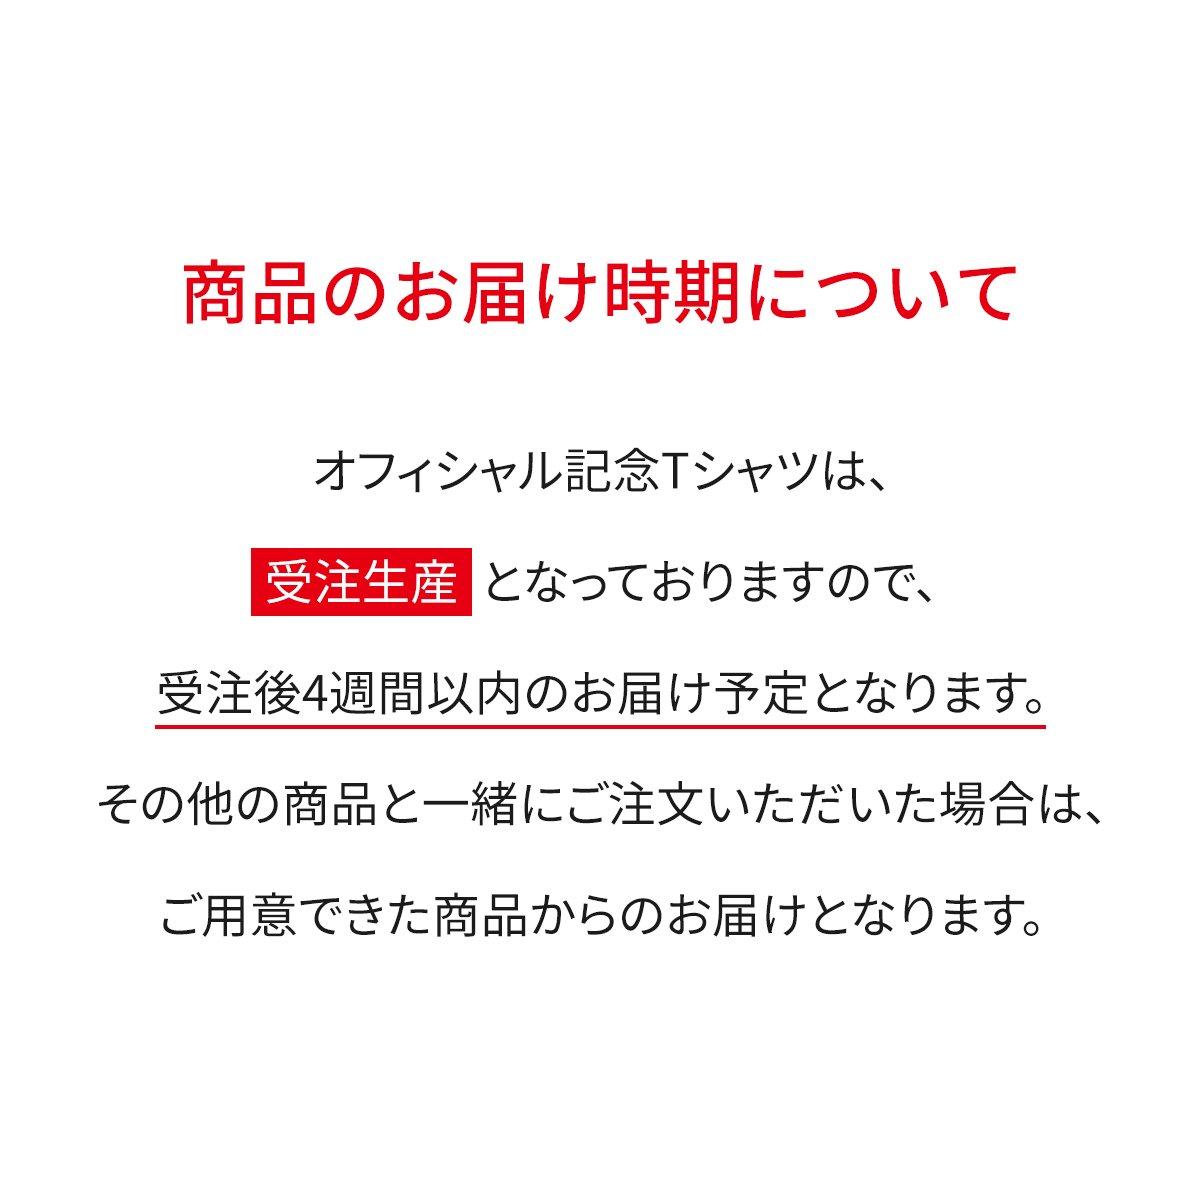 XF CUP 2020 第2回 日本クラブユース女子サッカー大会(U-18)オフィシャル記念Tシャツ ネイビー